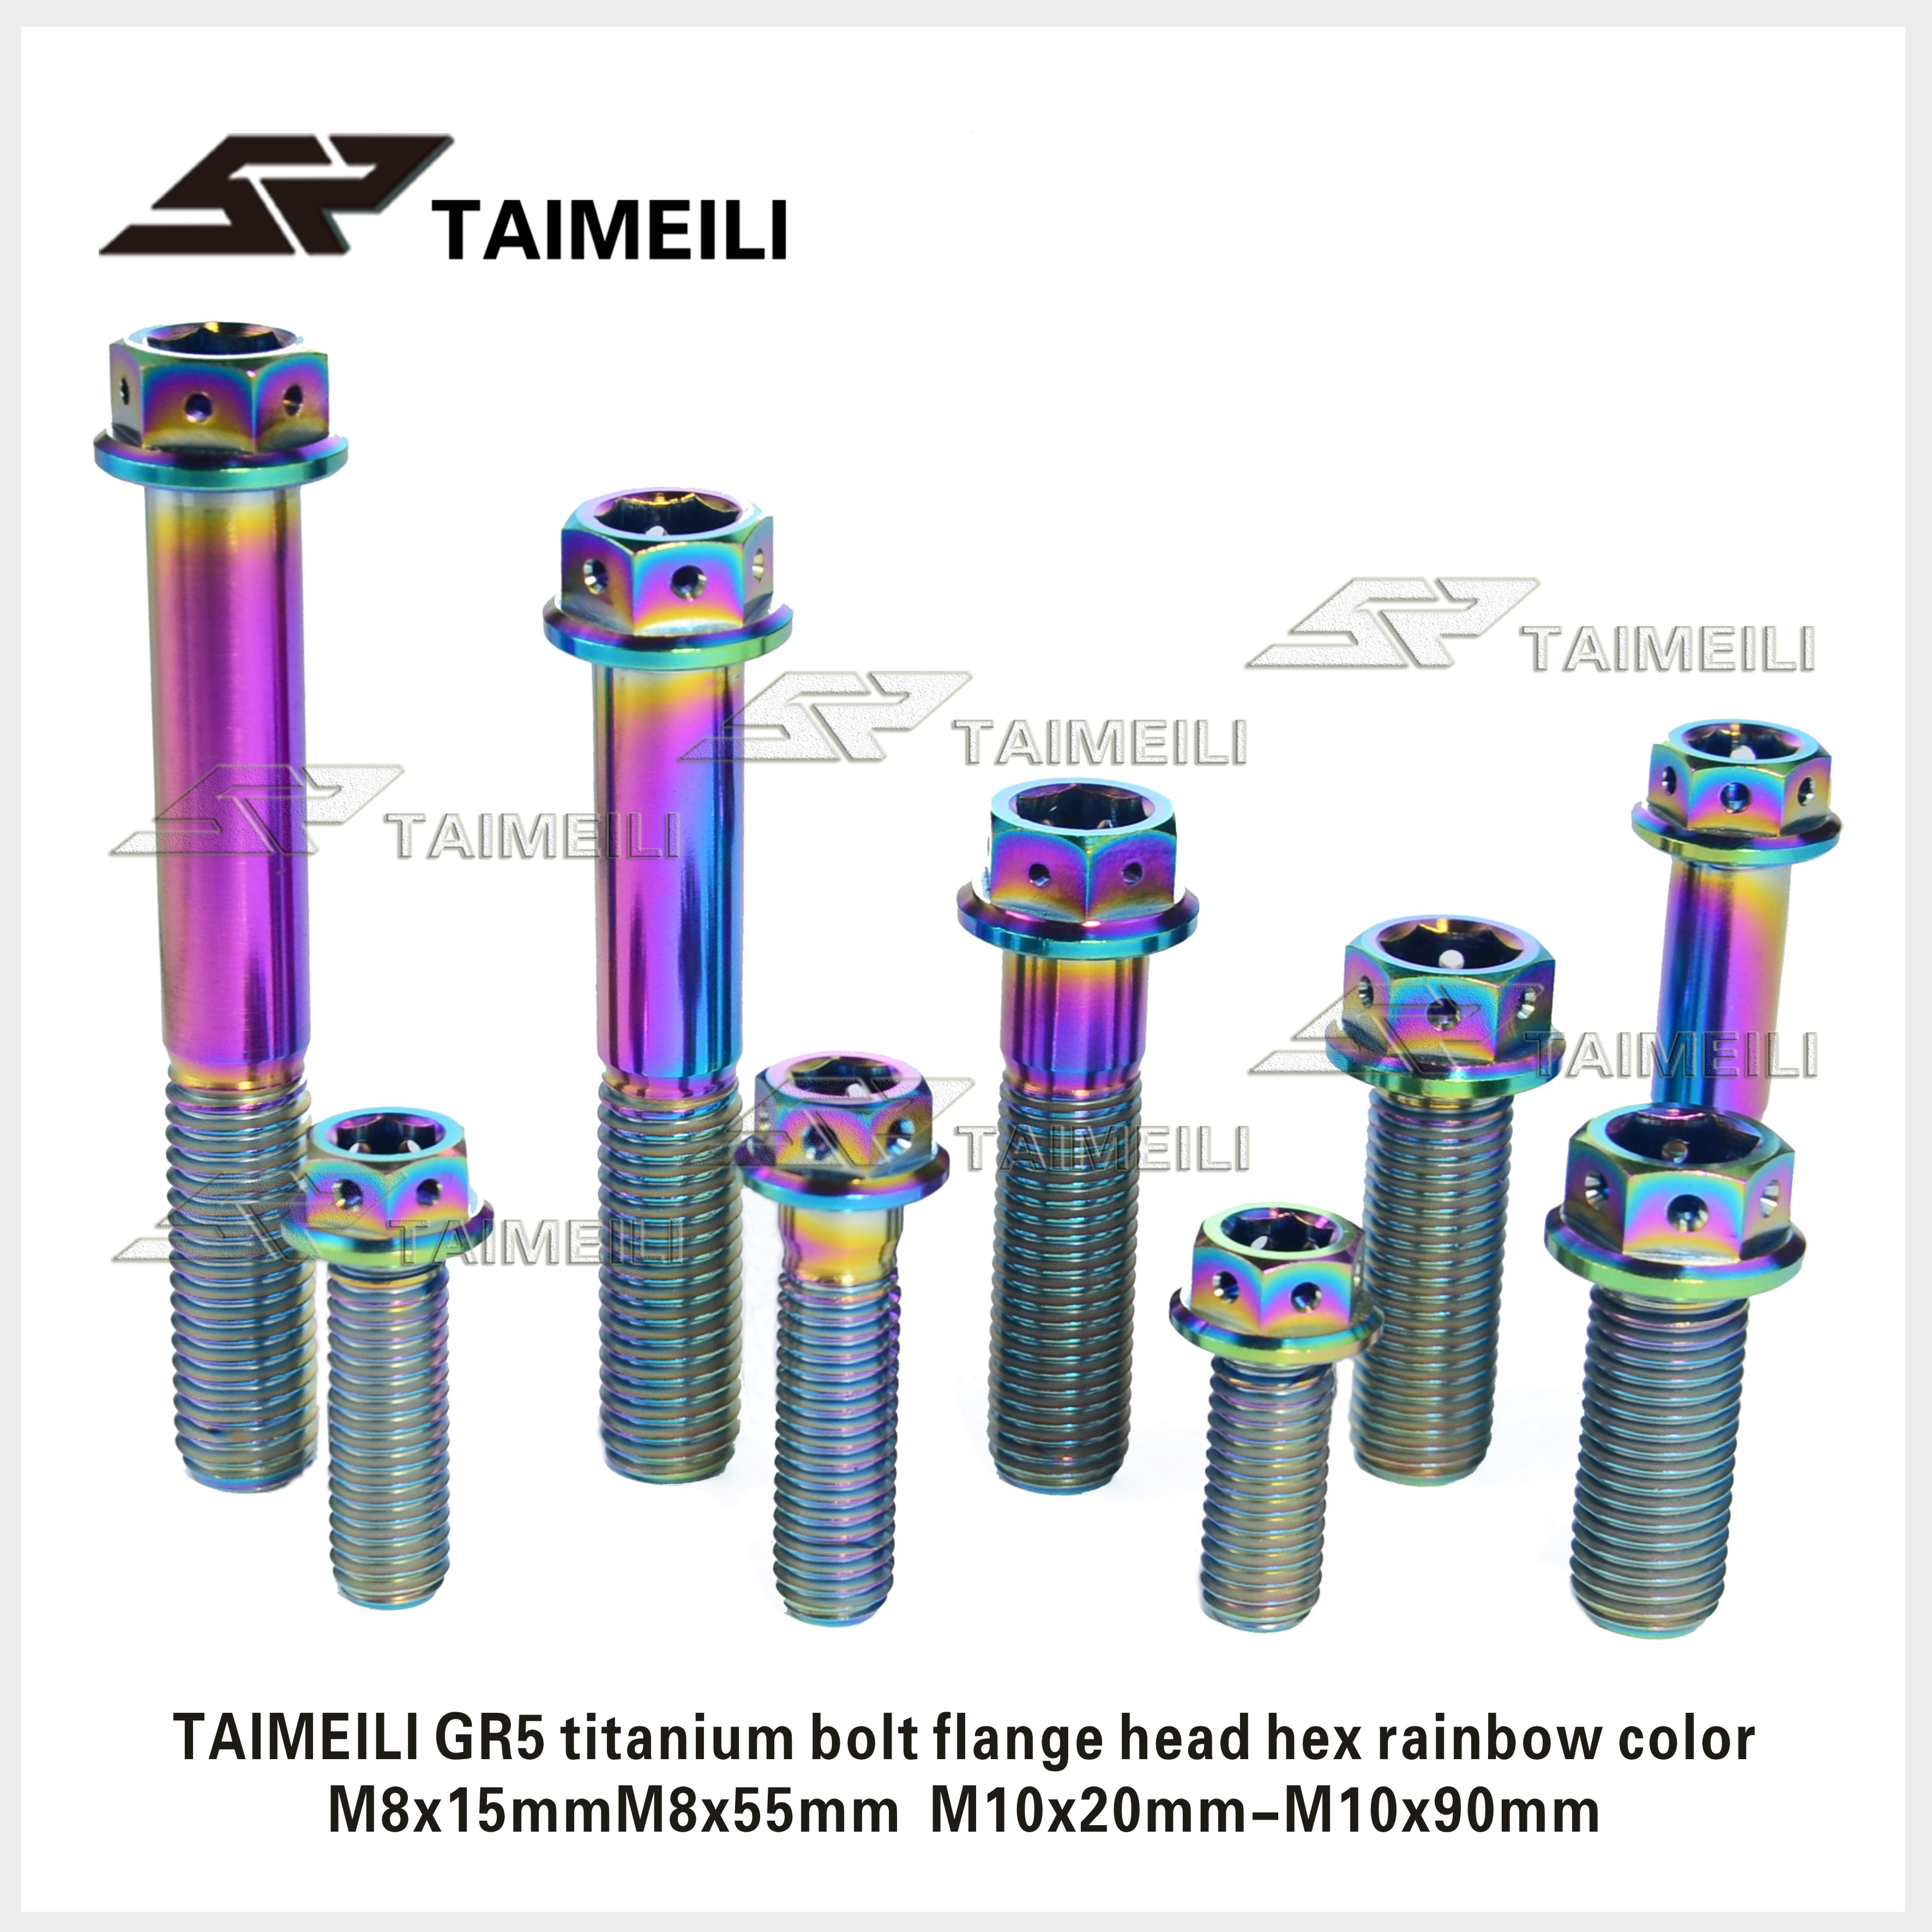 Titanium Alloy Bolt GR5 Flange Head Inside And Outside Hex Head M8M10x20-90mm Rainbow Color Motorcycle Conversion Bolt Repai